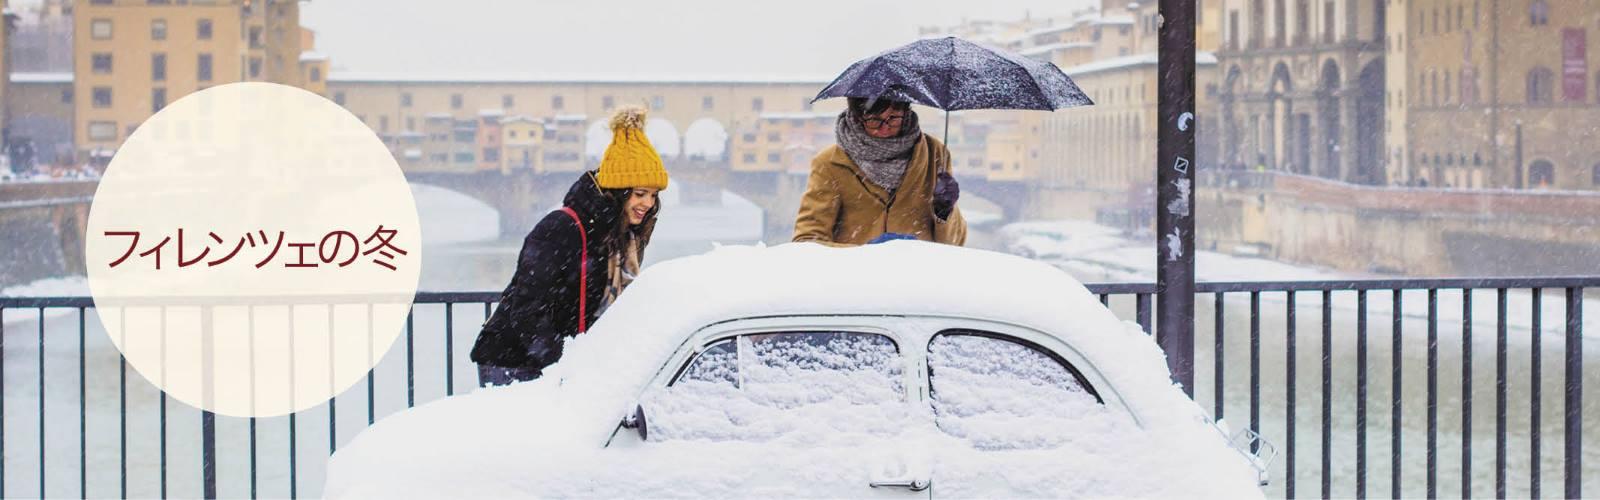 inverno-jp